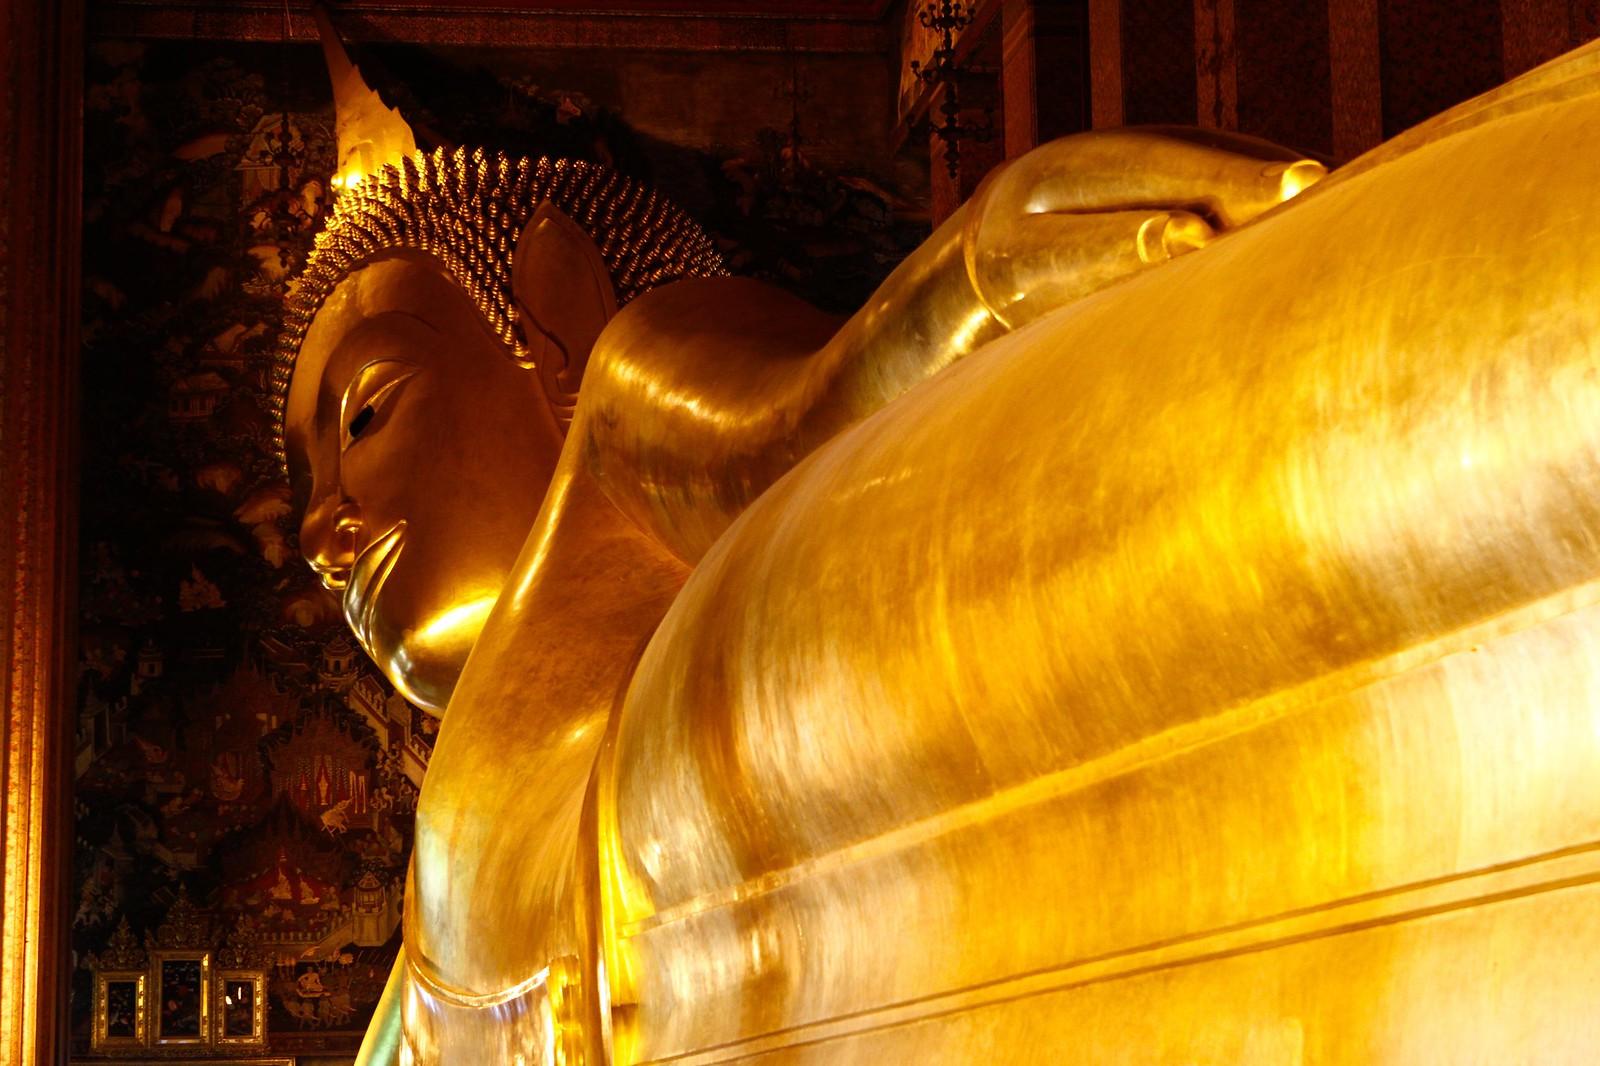 Wat Pho (Temple of the Reclining Buddha), Bangkok